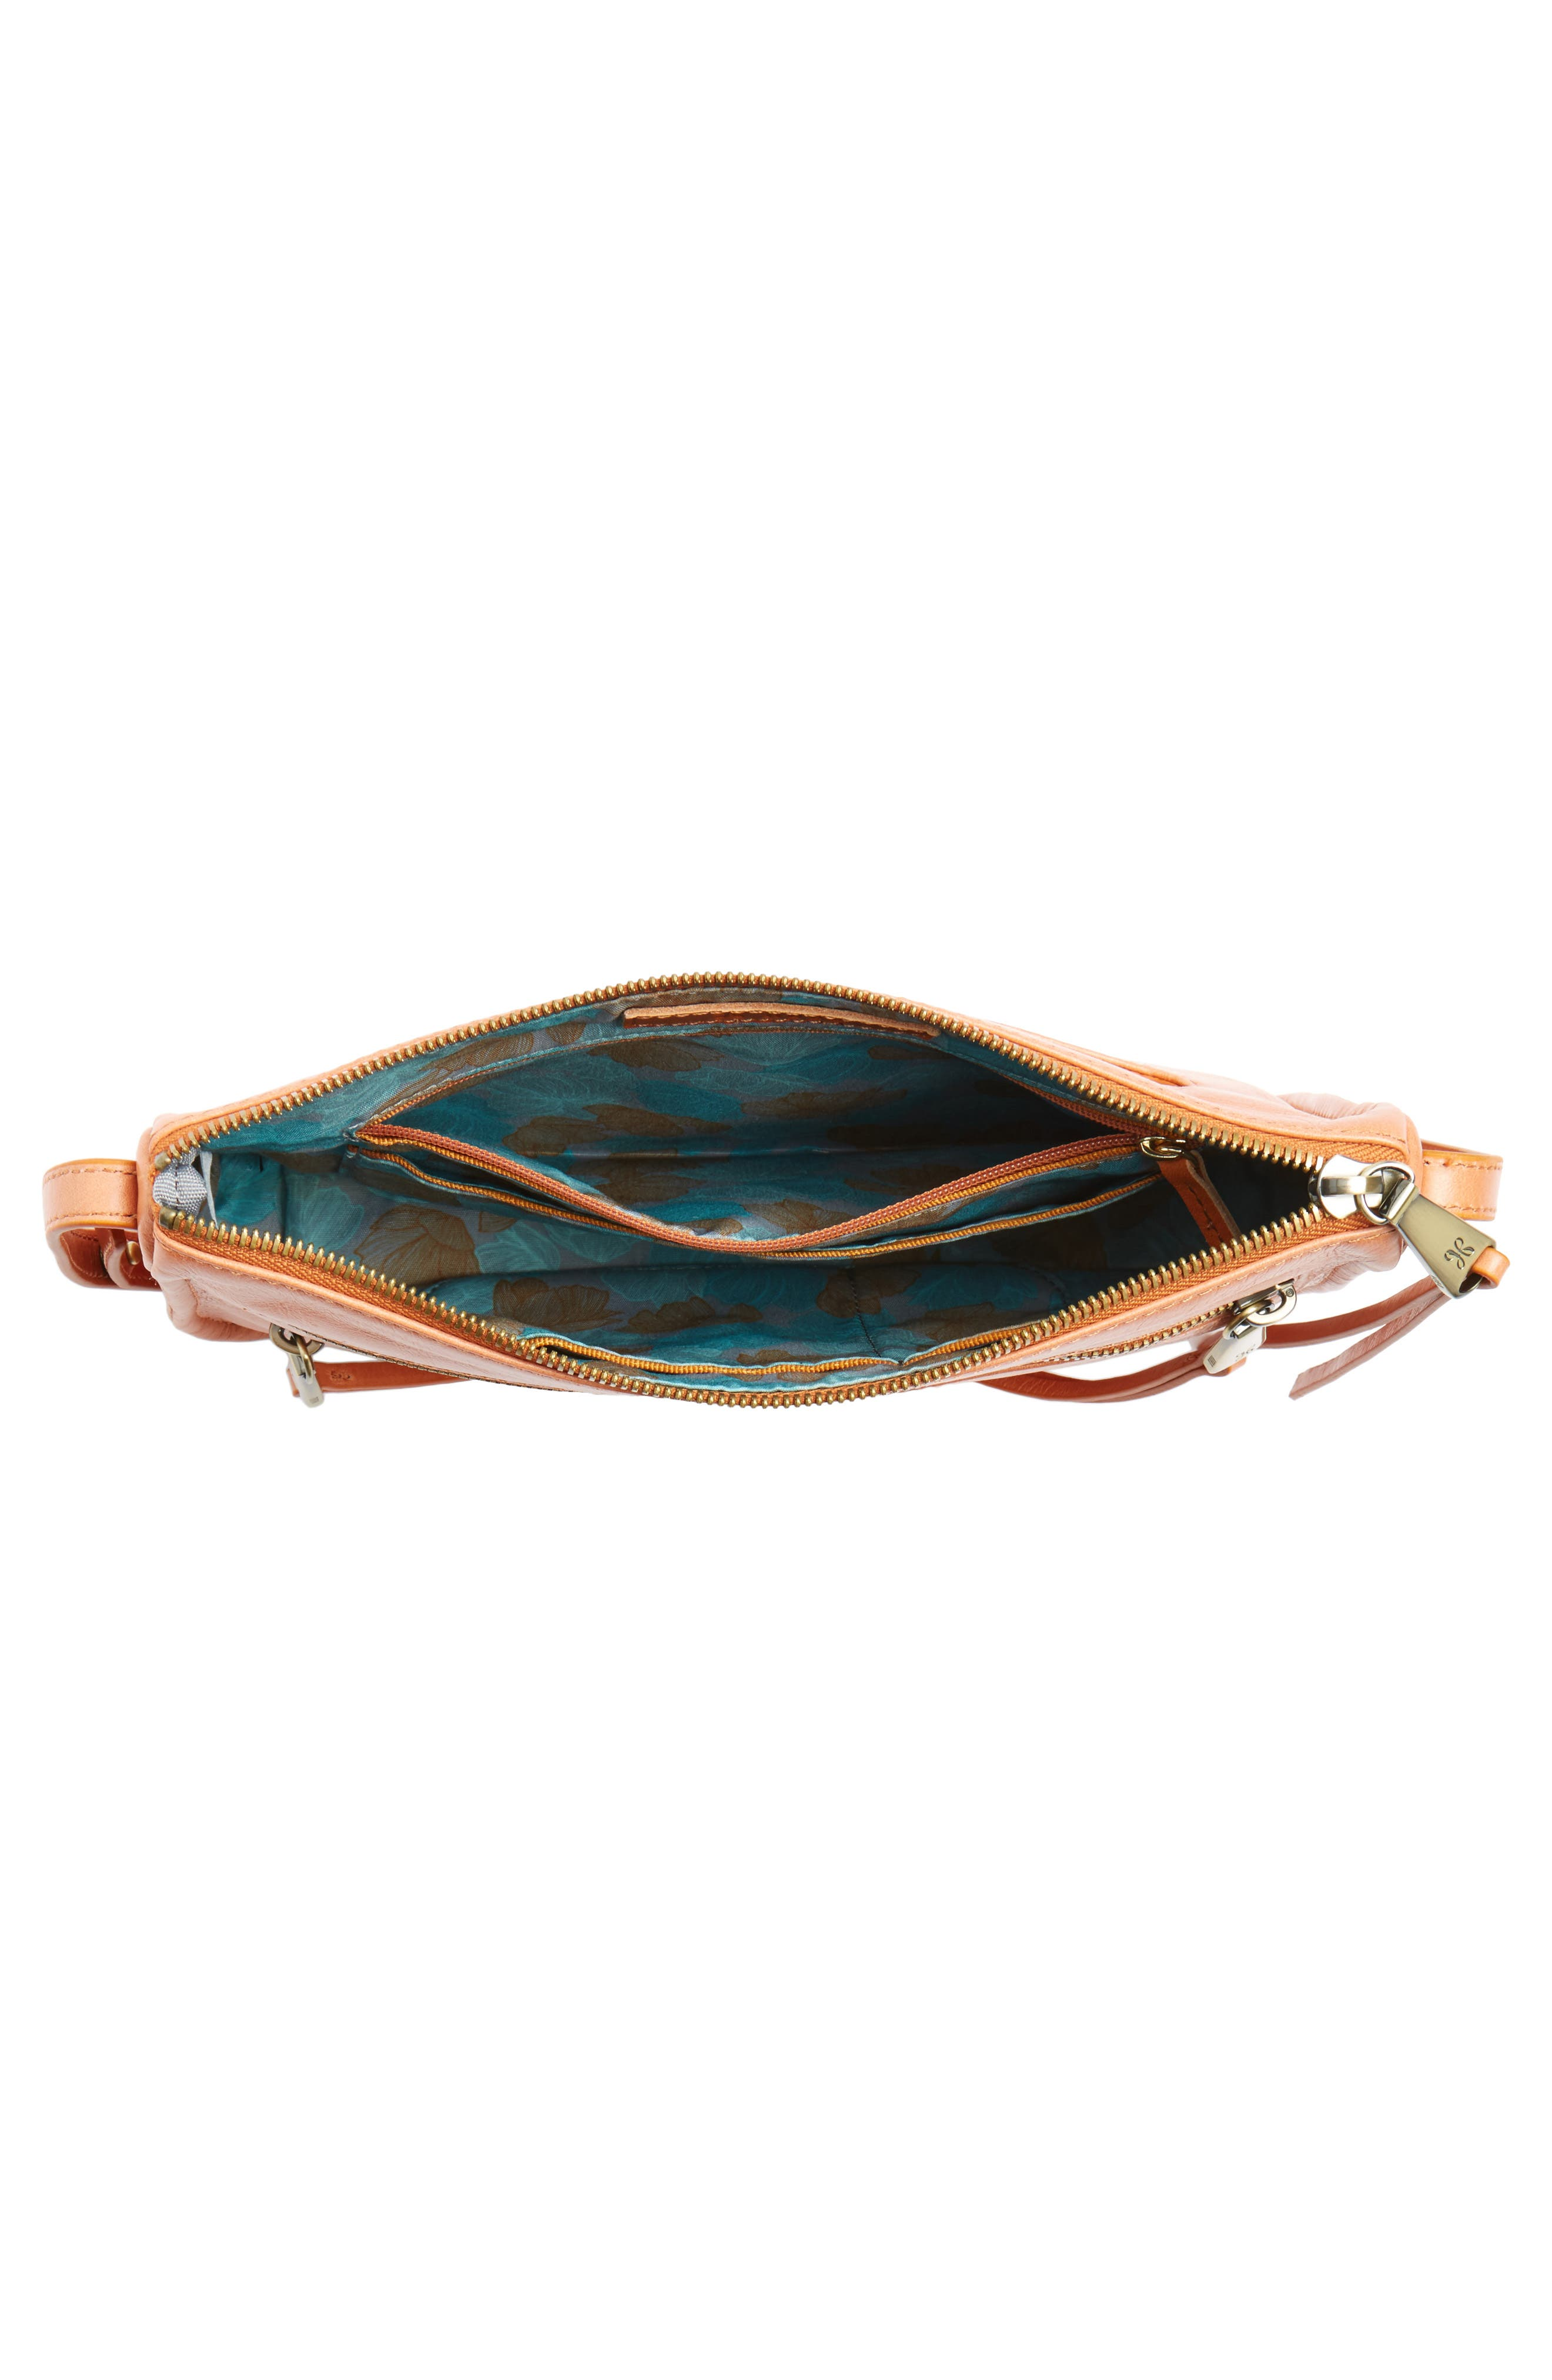 Alternate Image 3  - Hobo Mission Leather Crossbody Bag